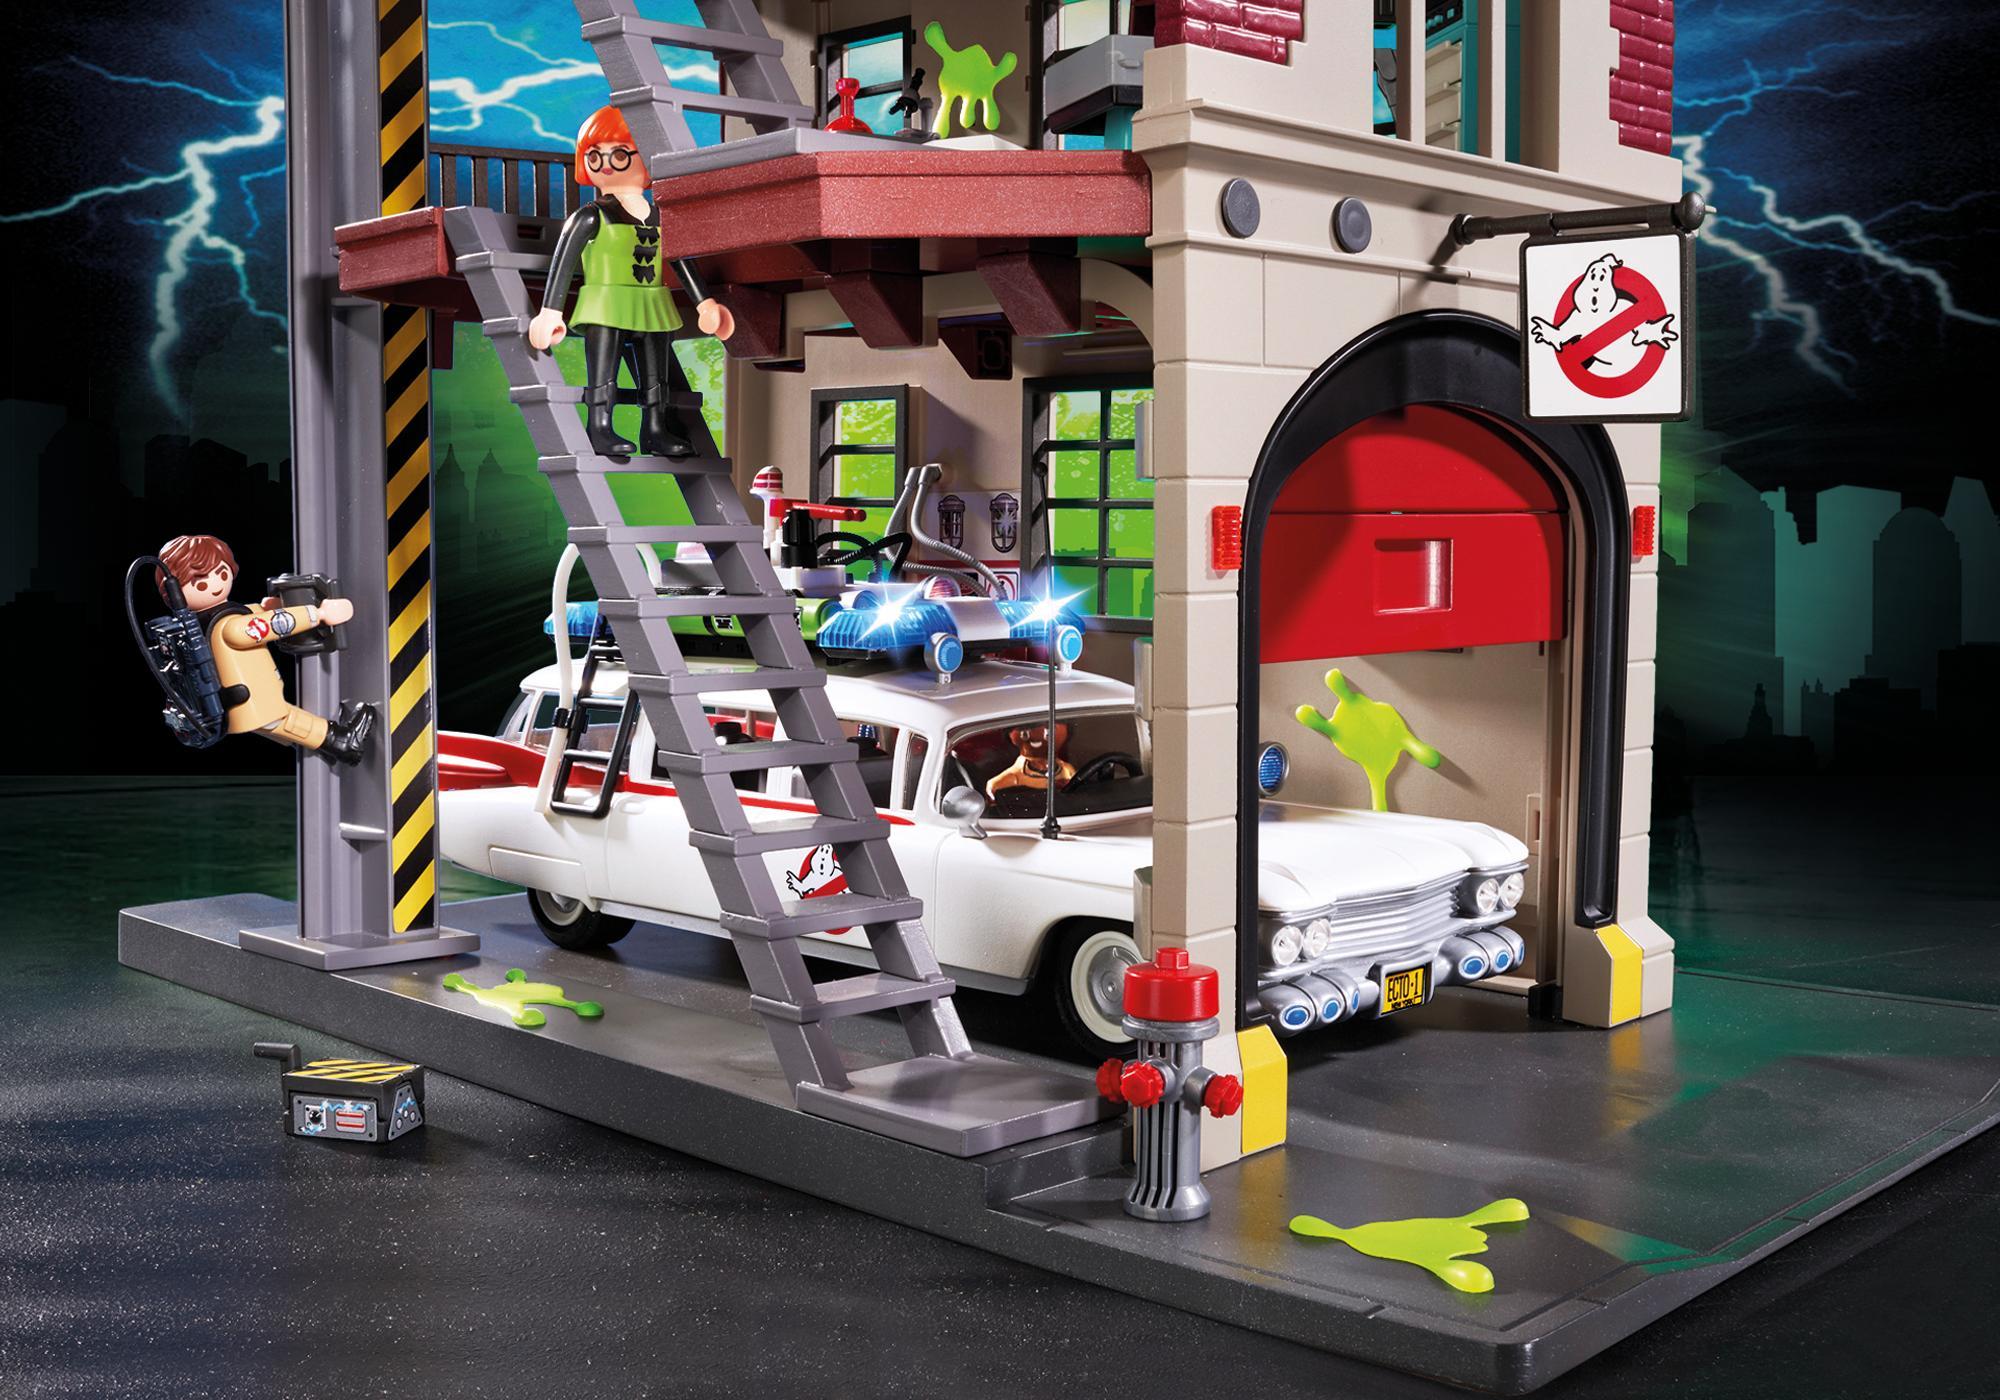 http://media.playmobil.com/i/playmobil/9220_product_extra1/Ghostbusters Ecto-1